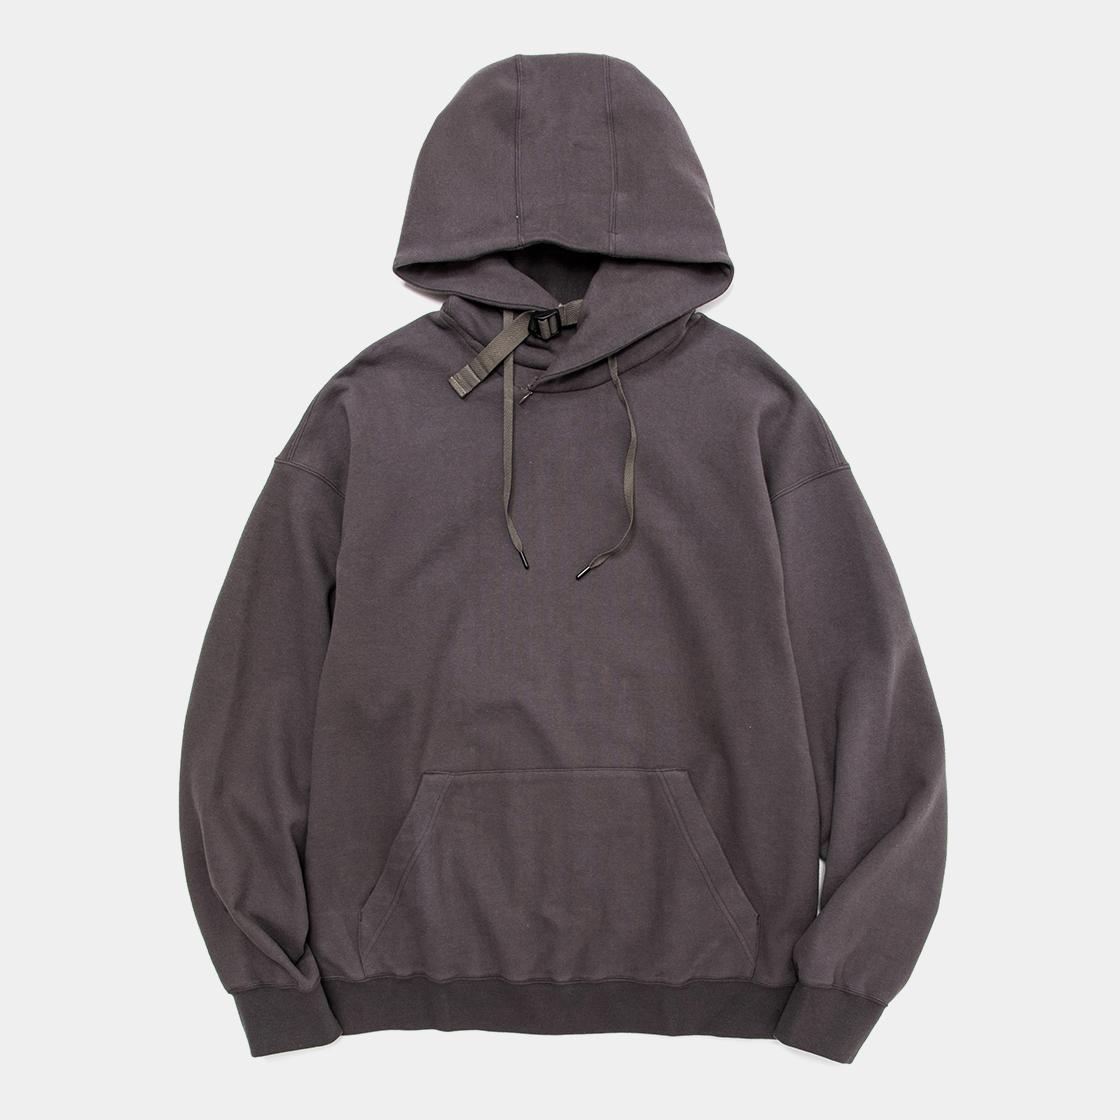 Open Hooded Sweat SH / Charcoal